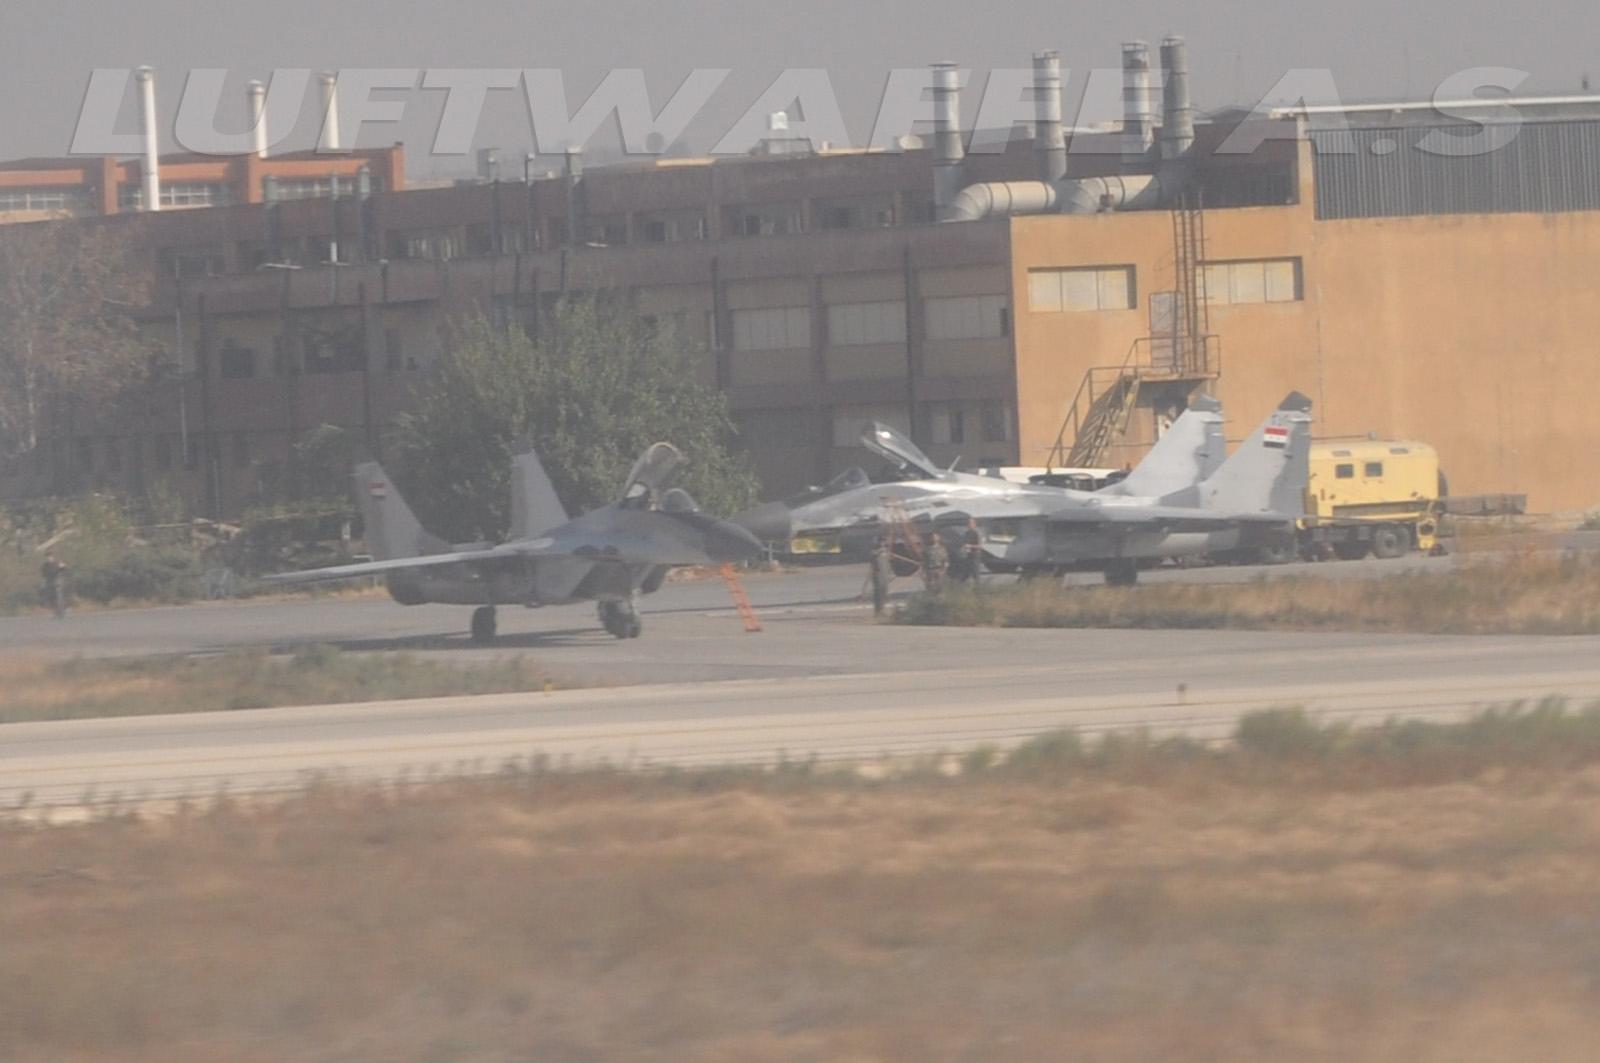 http://3.bp.blogspot.com/-2gR52MEZ3Z4/TZmPx1VTAnI/AAAAAAAAAuY/FGuVta_p-Lk/s1600/MiG-29K+Fulcrum-A++unknown++++2011.JPG